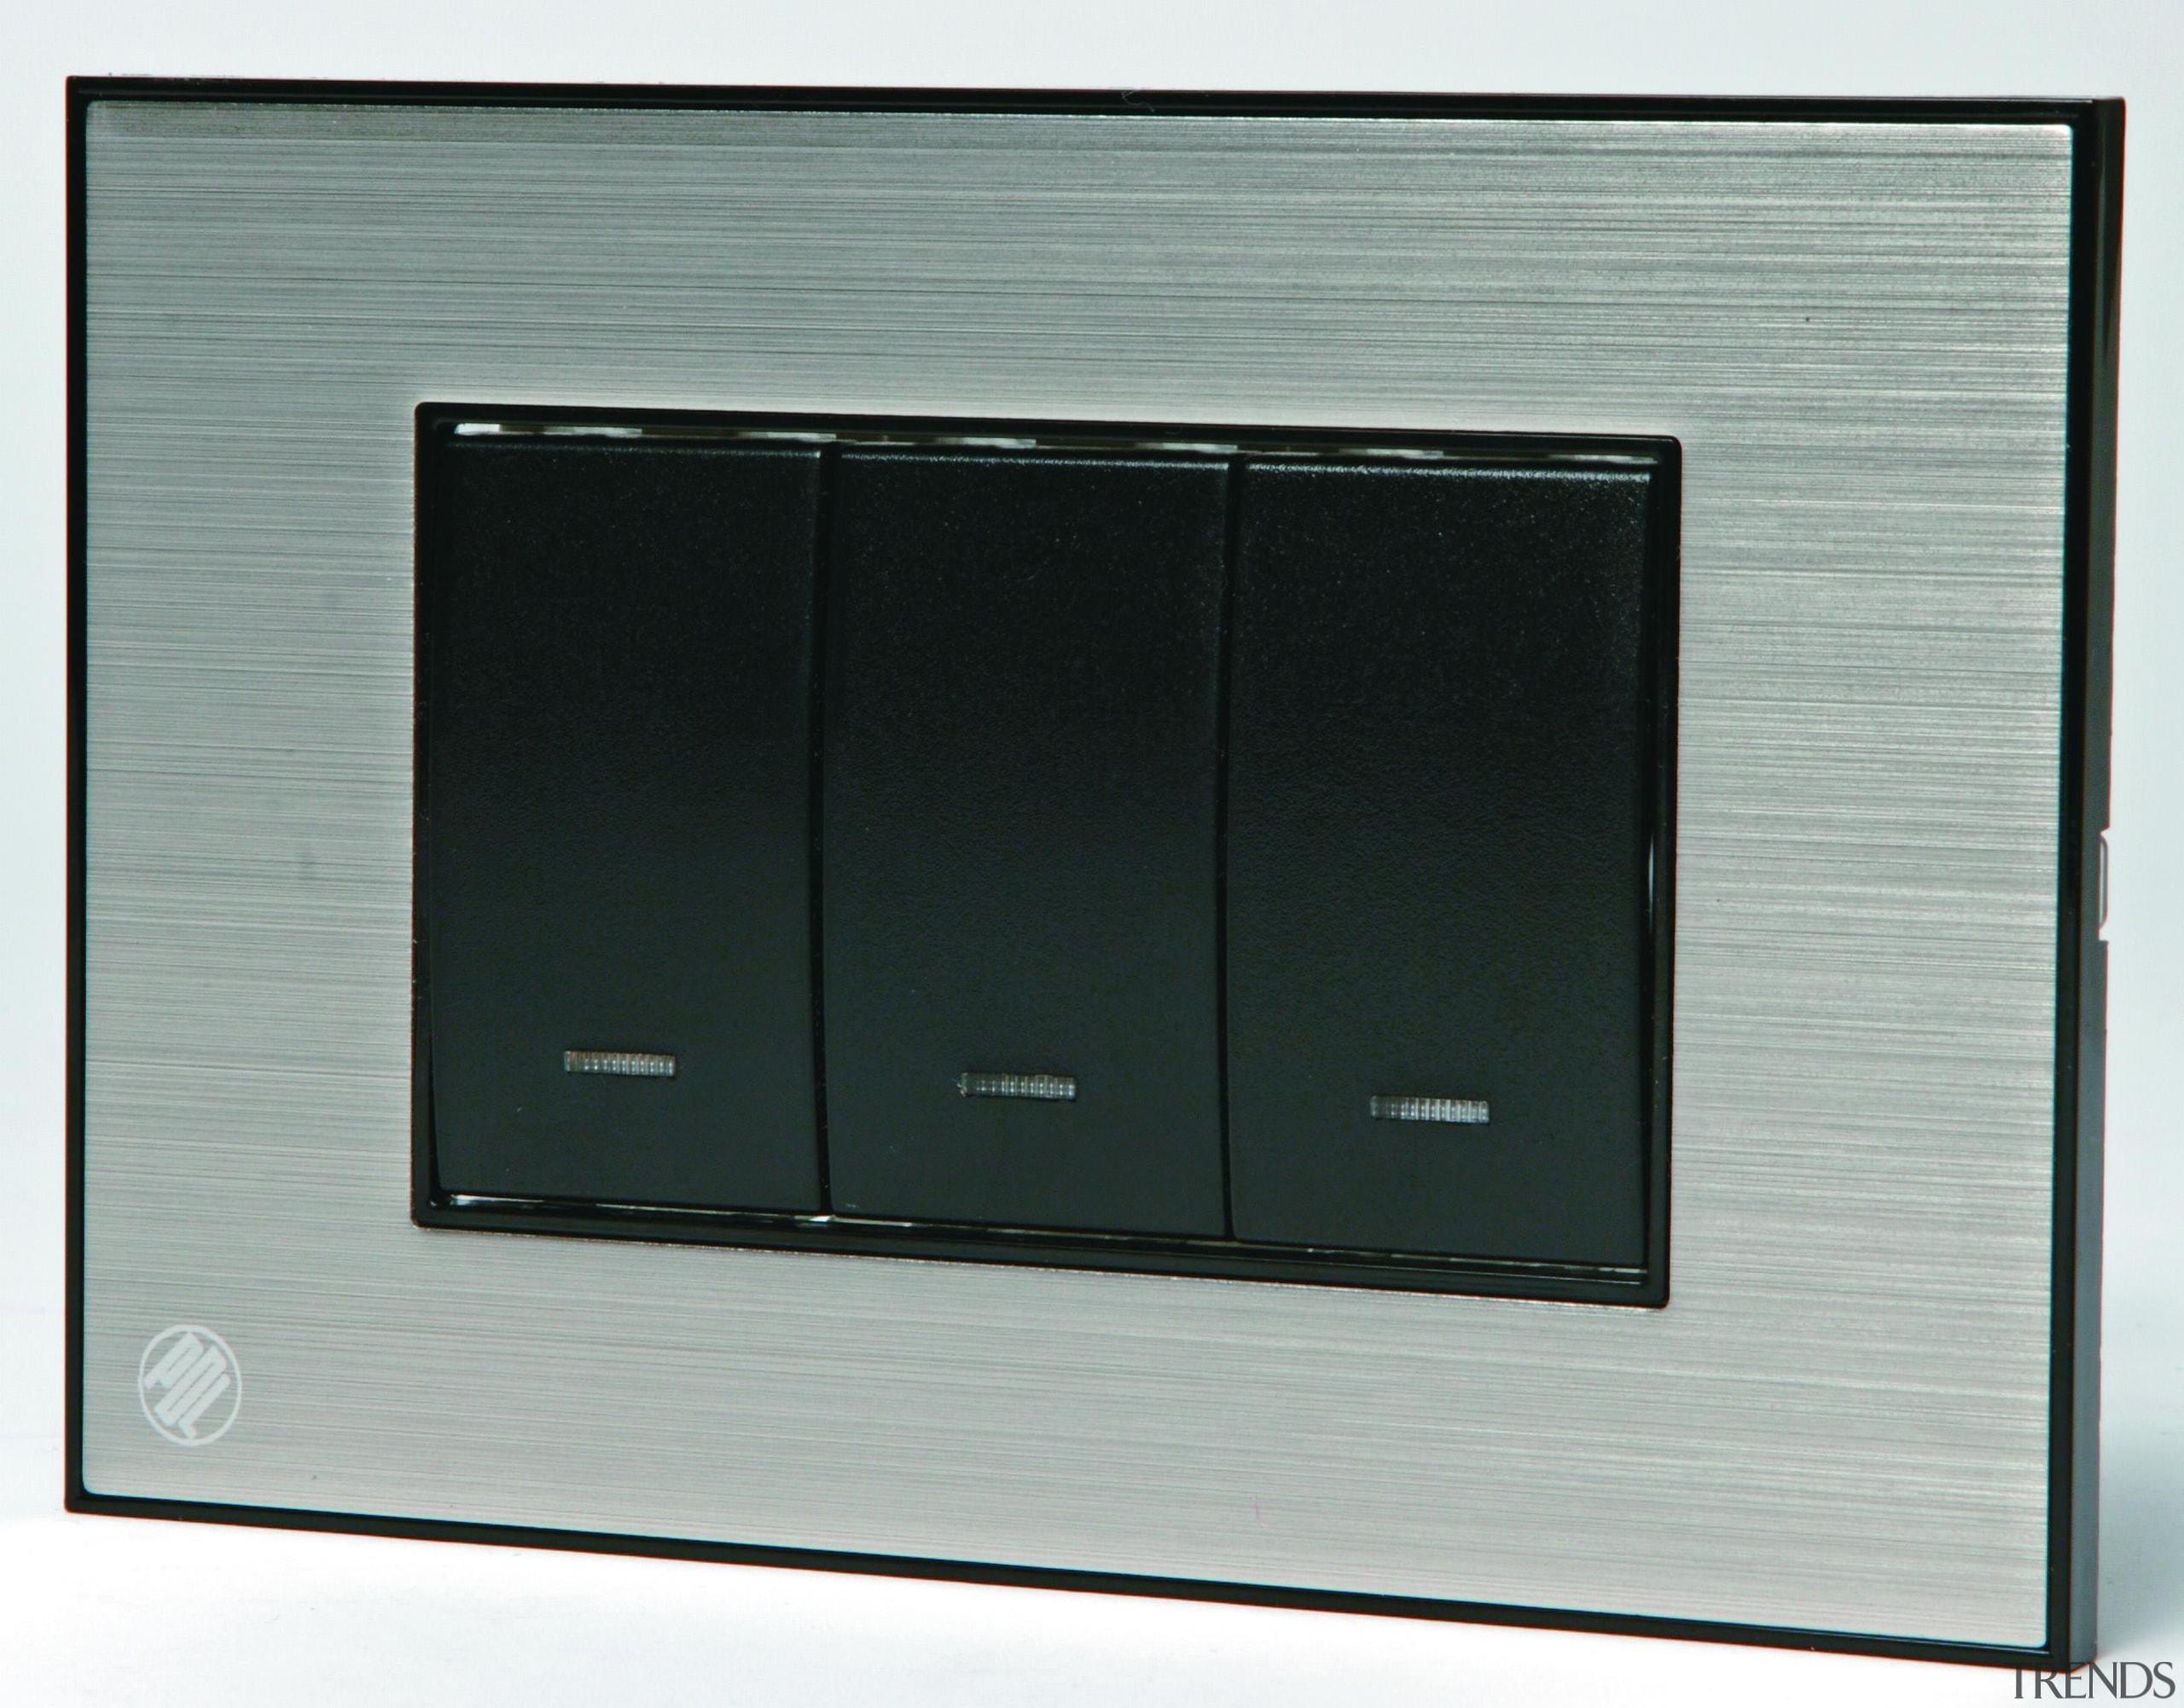 s883-0029987.jpg - s883-0029987.jpg - product design   technology product design, technology, gray, black